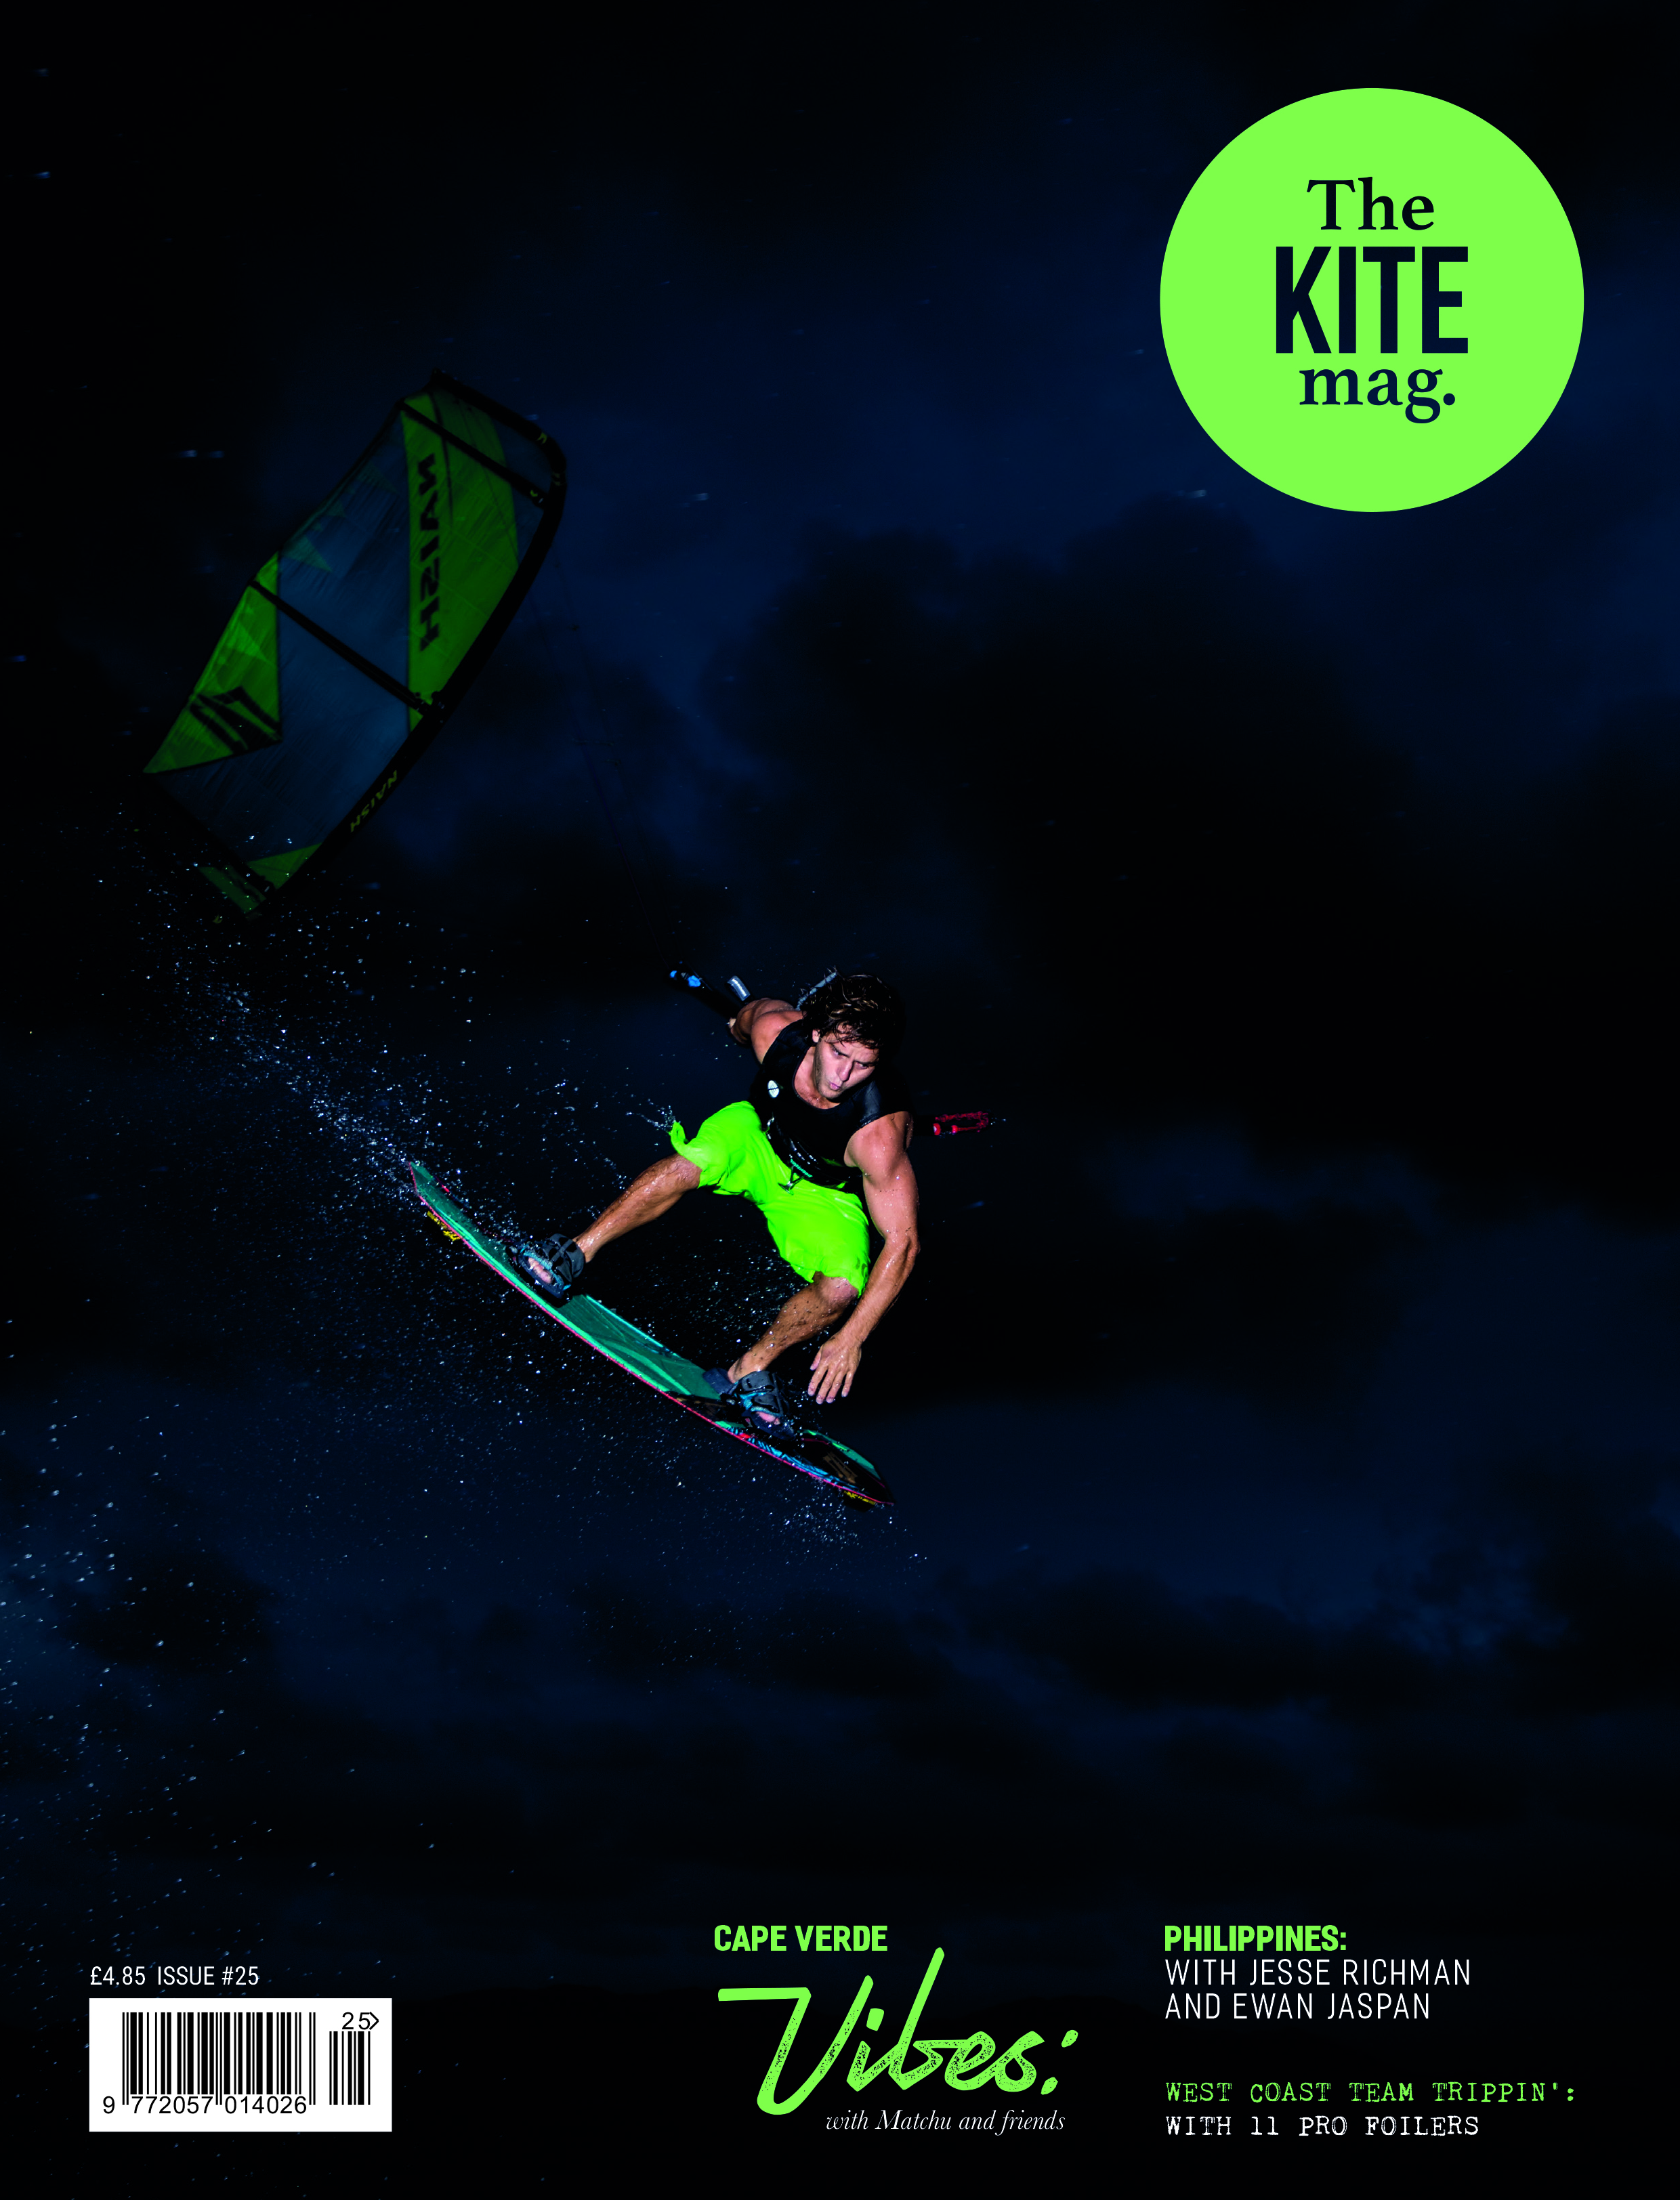 Cover 25 Kitemag - TheKiteMag - Française (Aperçu)